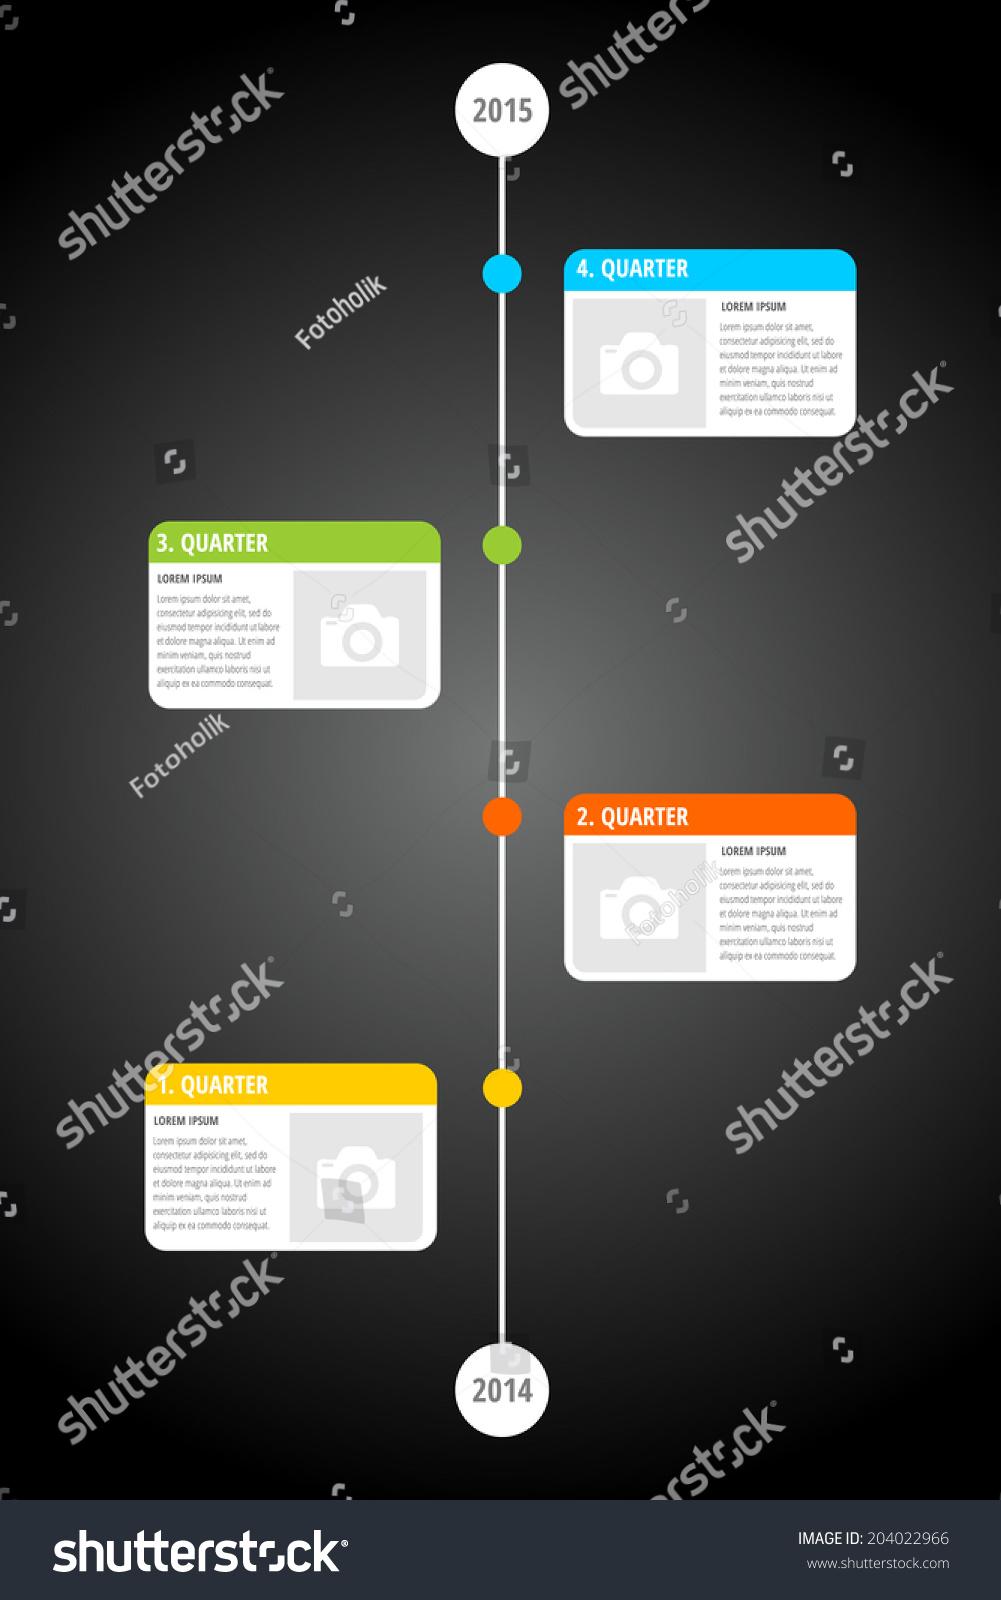 quarterly timeline - Ideal.vistalist.co